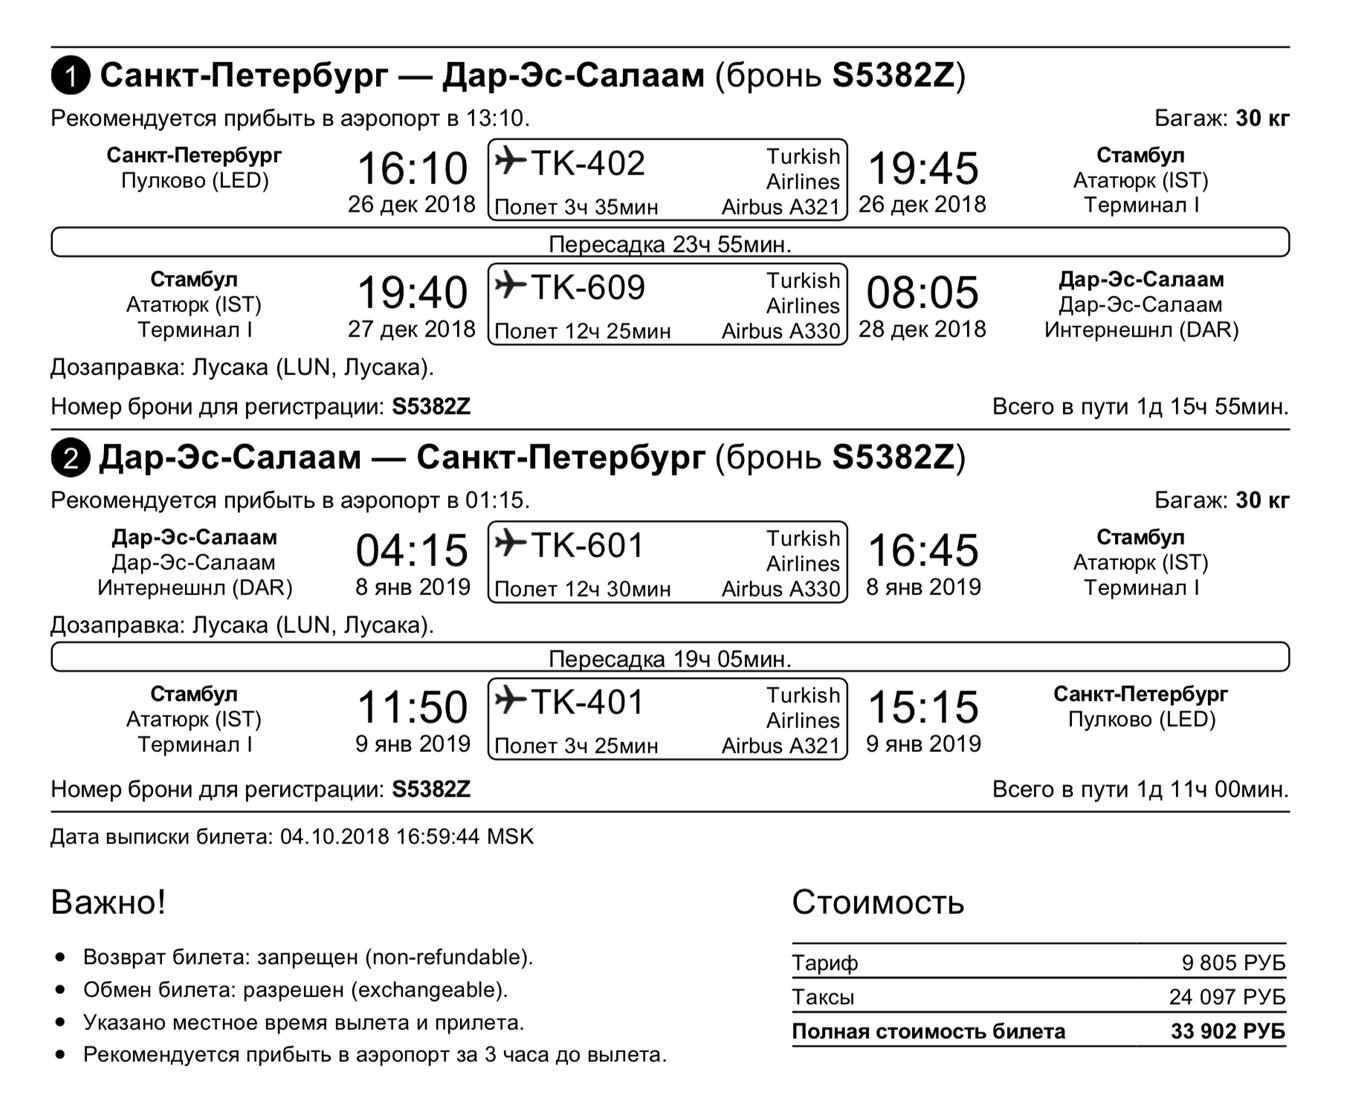 Мой билет до Дар-эс-Салама